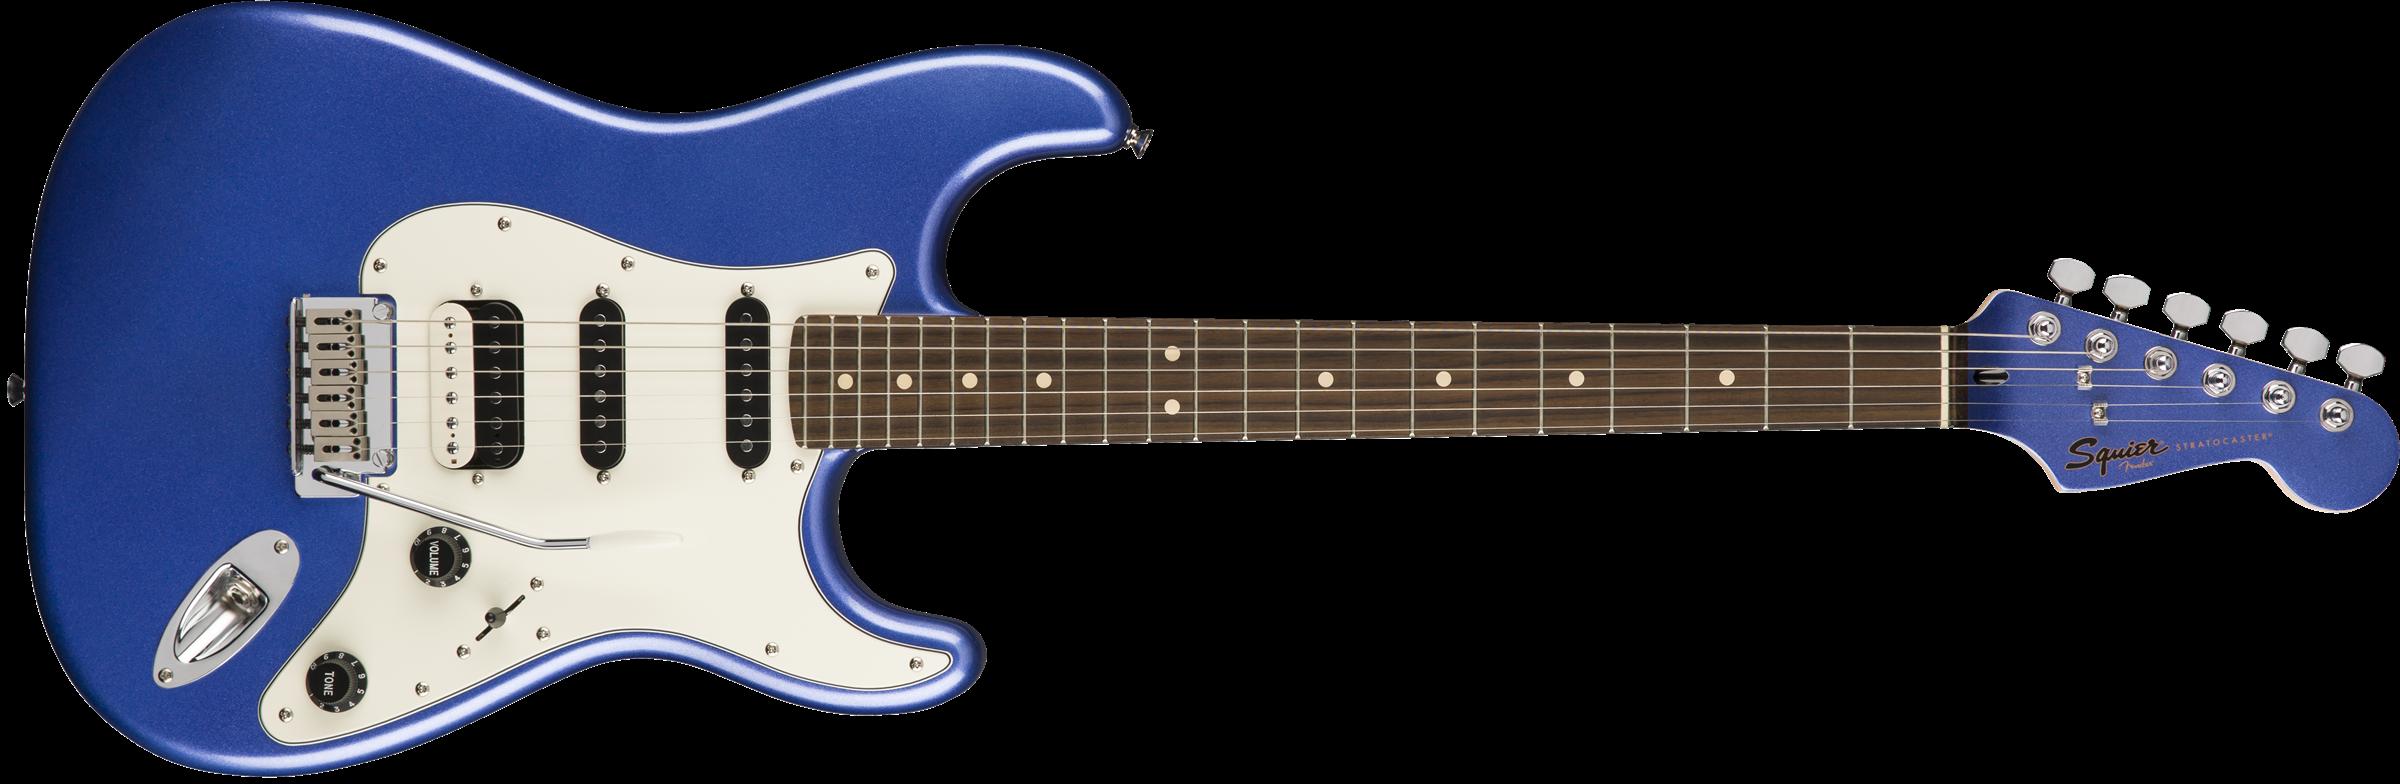 SQUIER Contemporary Stratocaster HSS, Rosewood Fingerboard, Ocean Blue Metallic